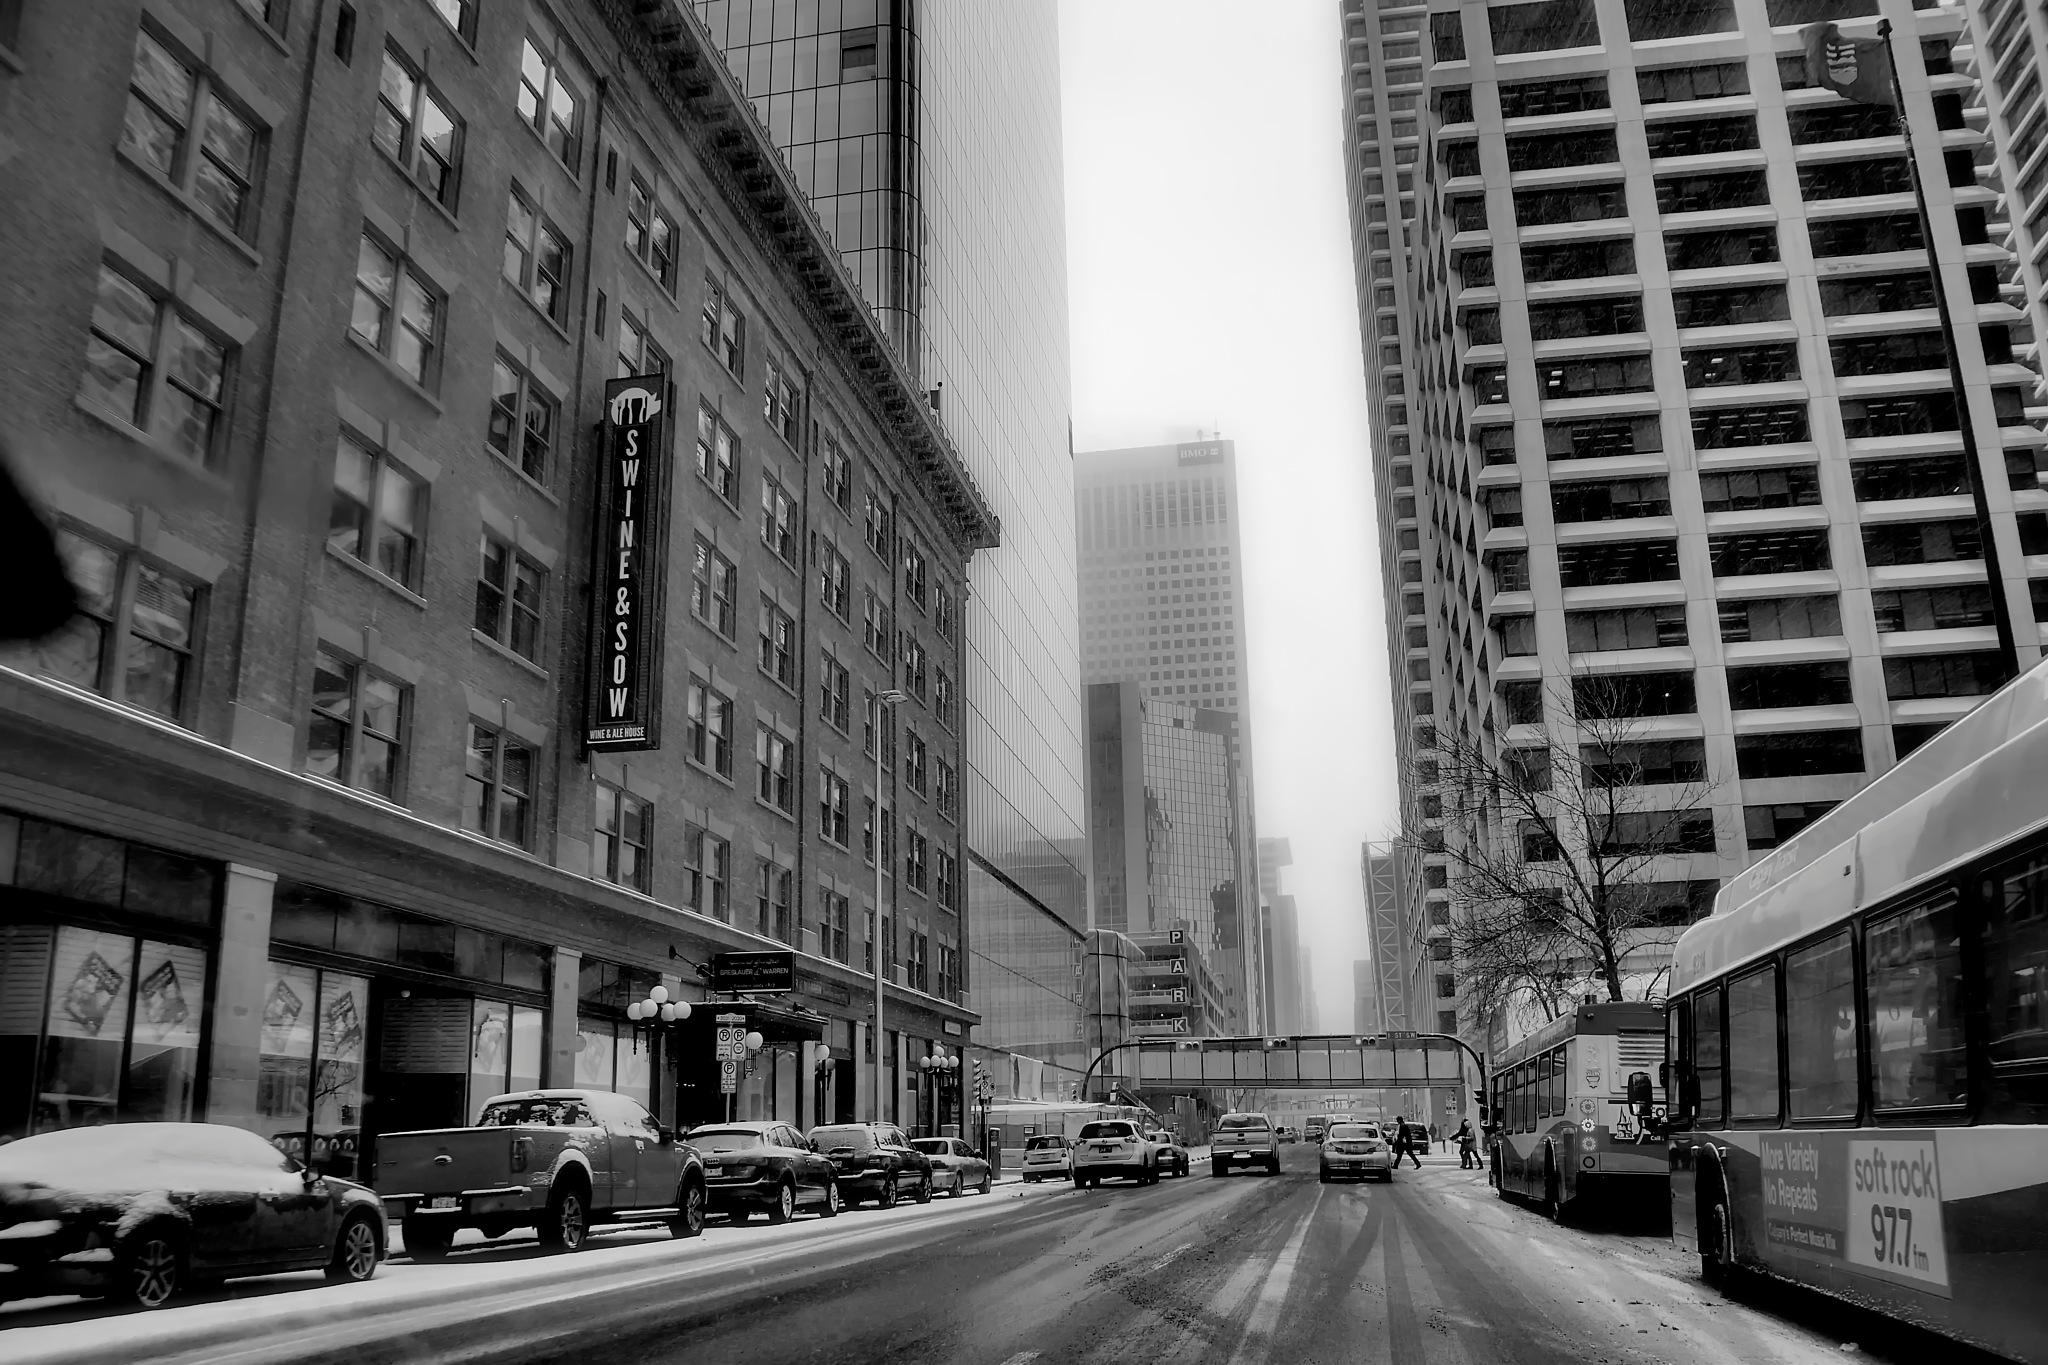 Avenue in Calgary by WSimone